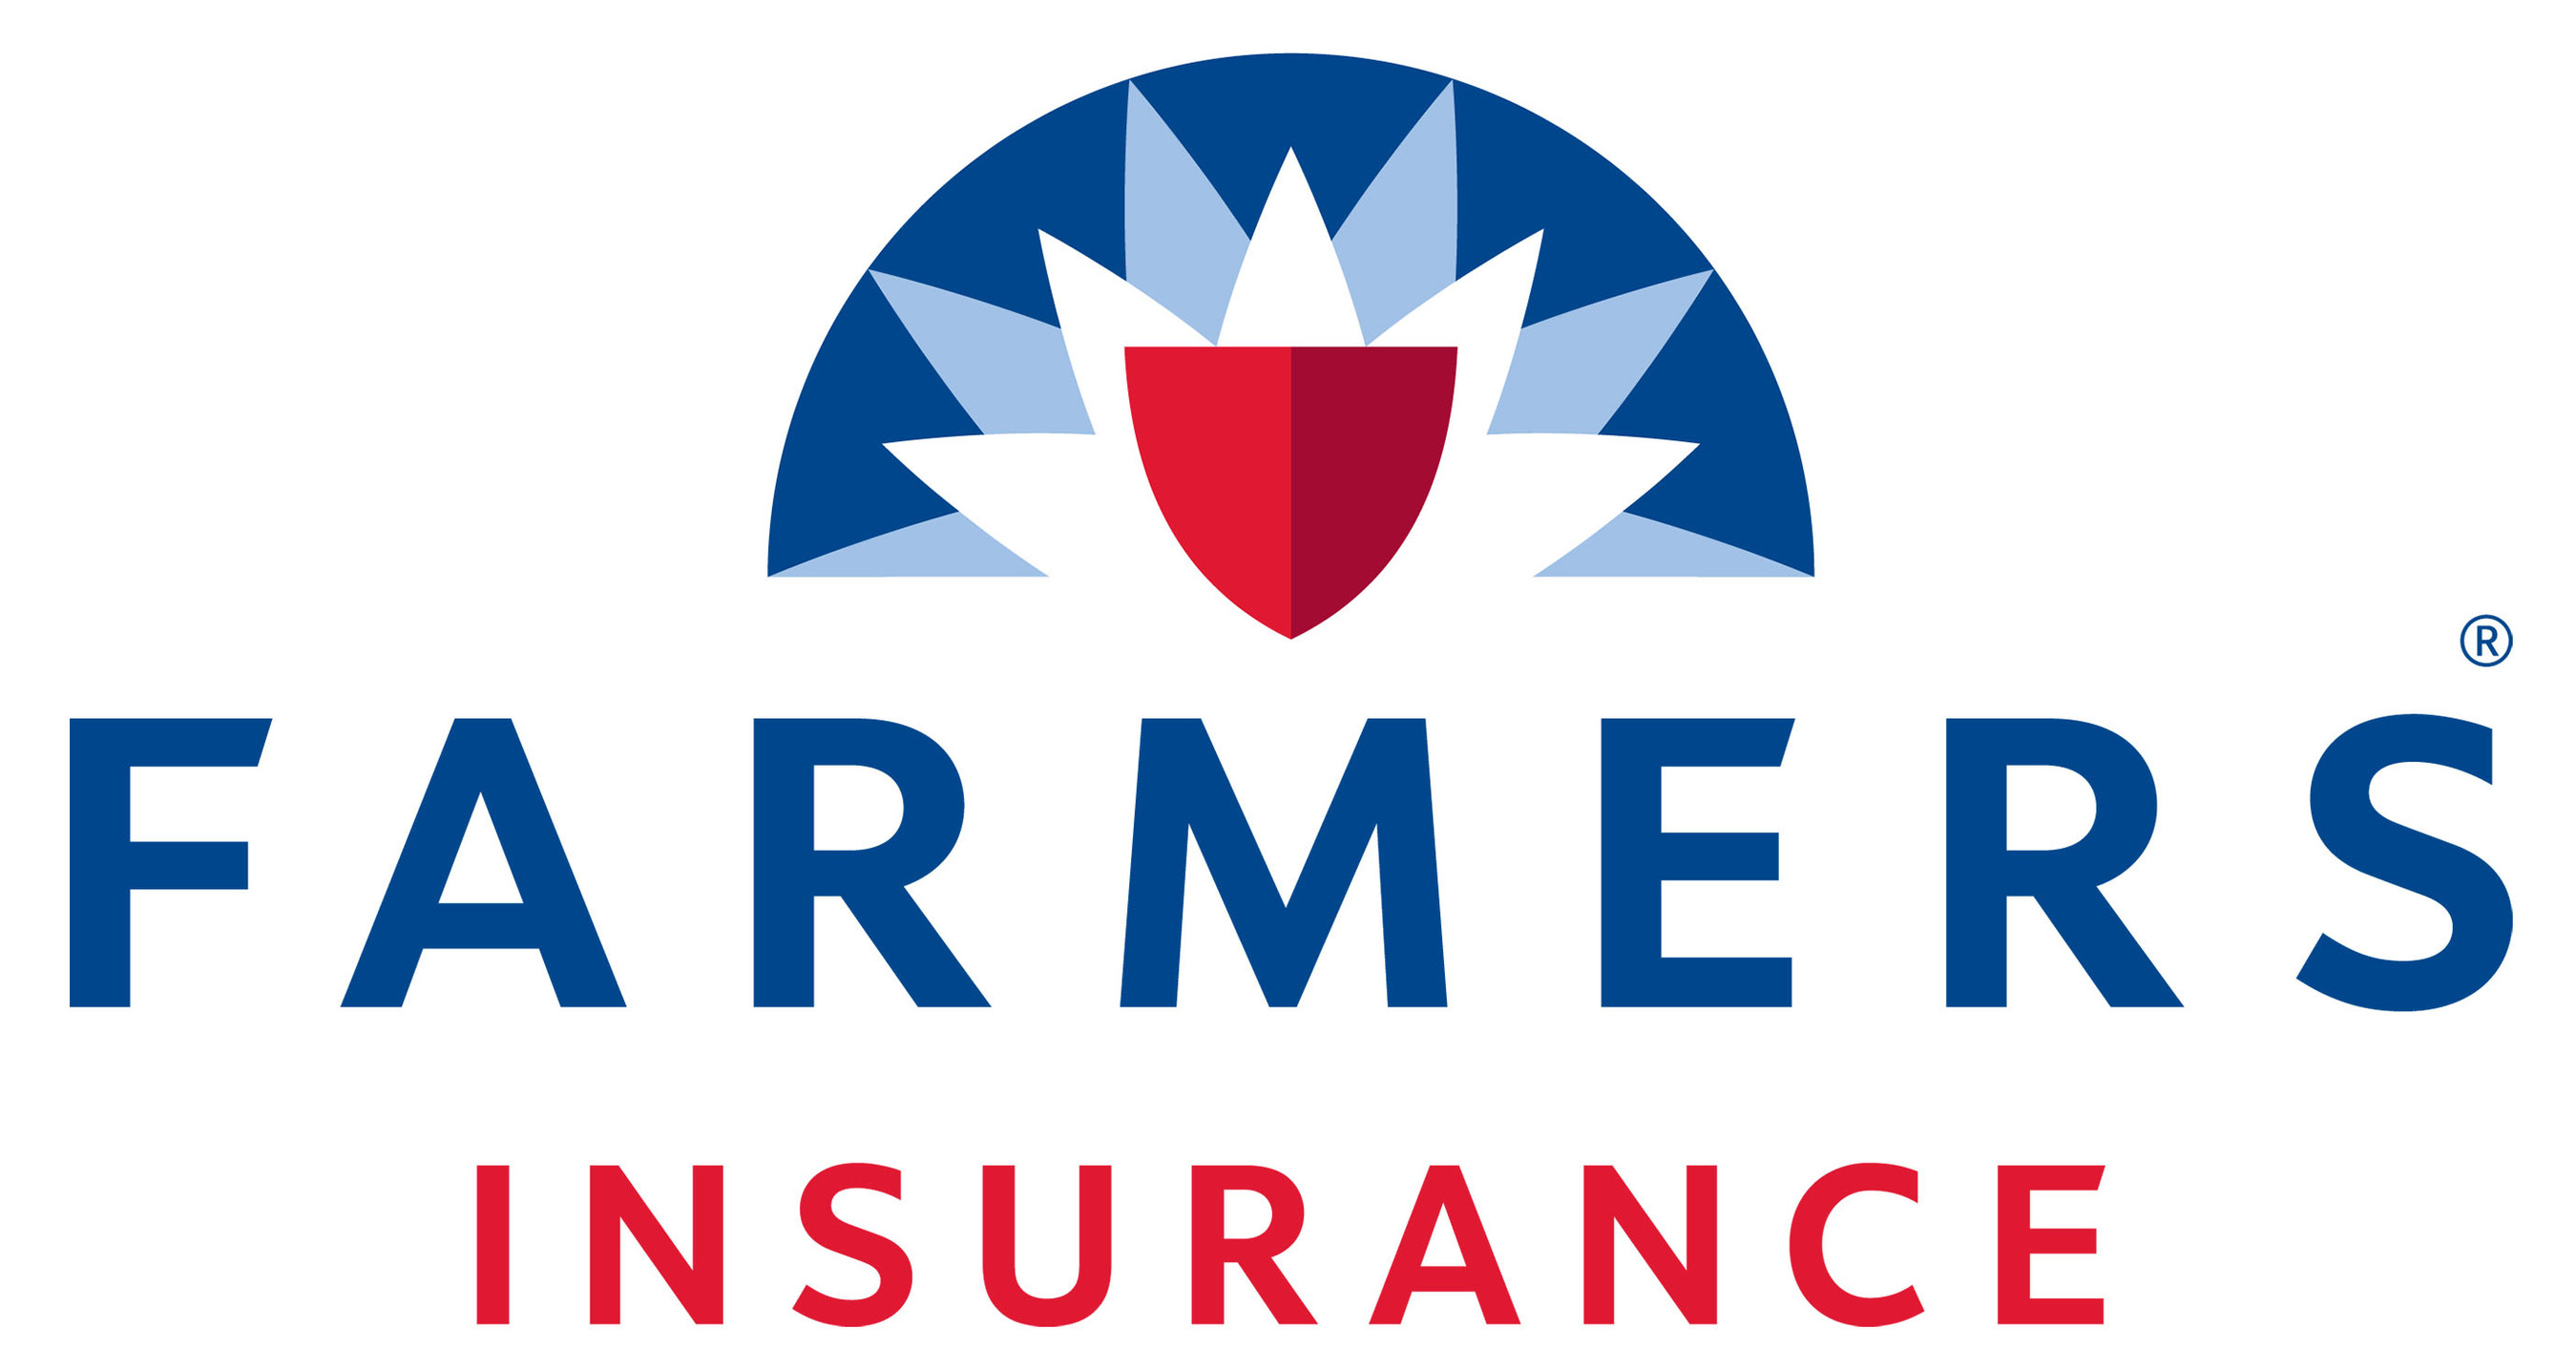 farmers insurance logo jpg?p=facebook.'